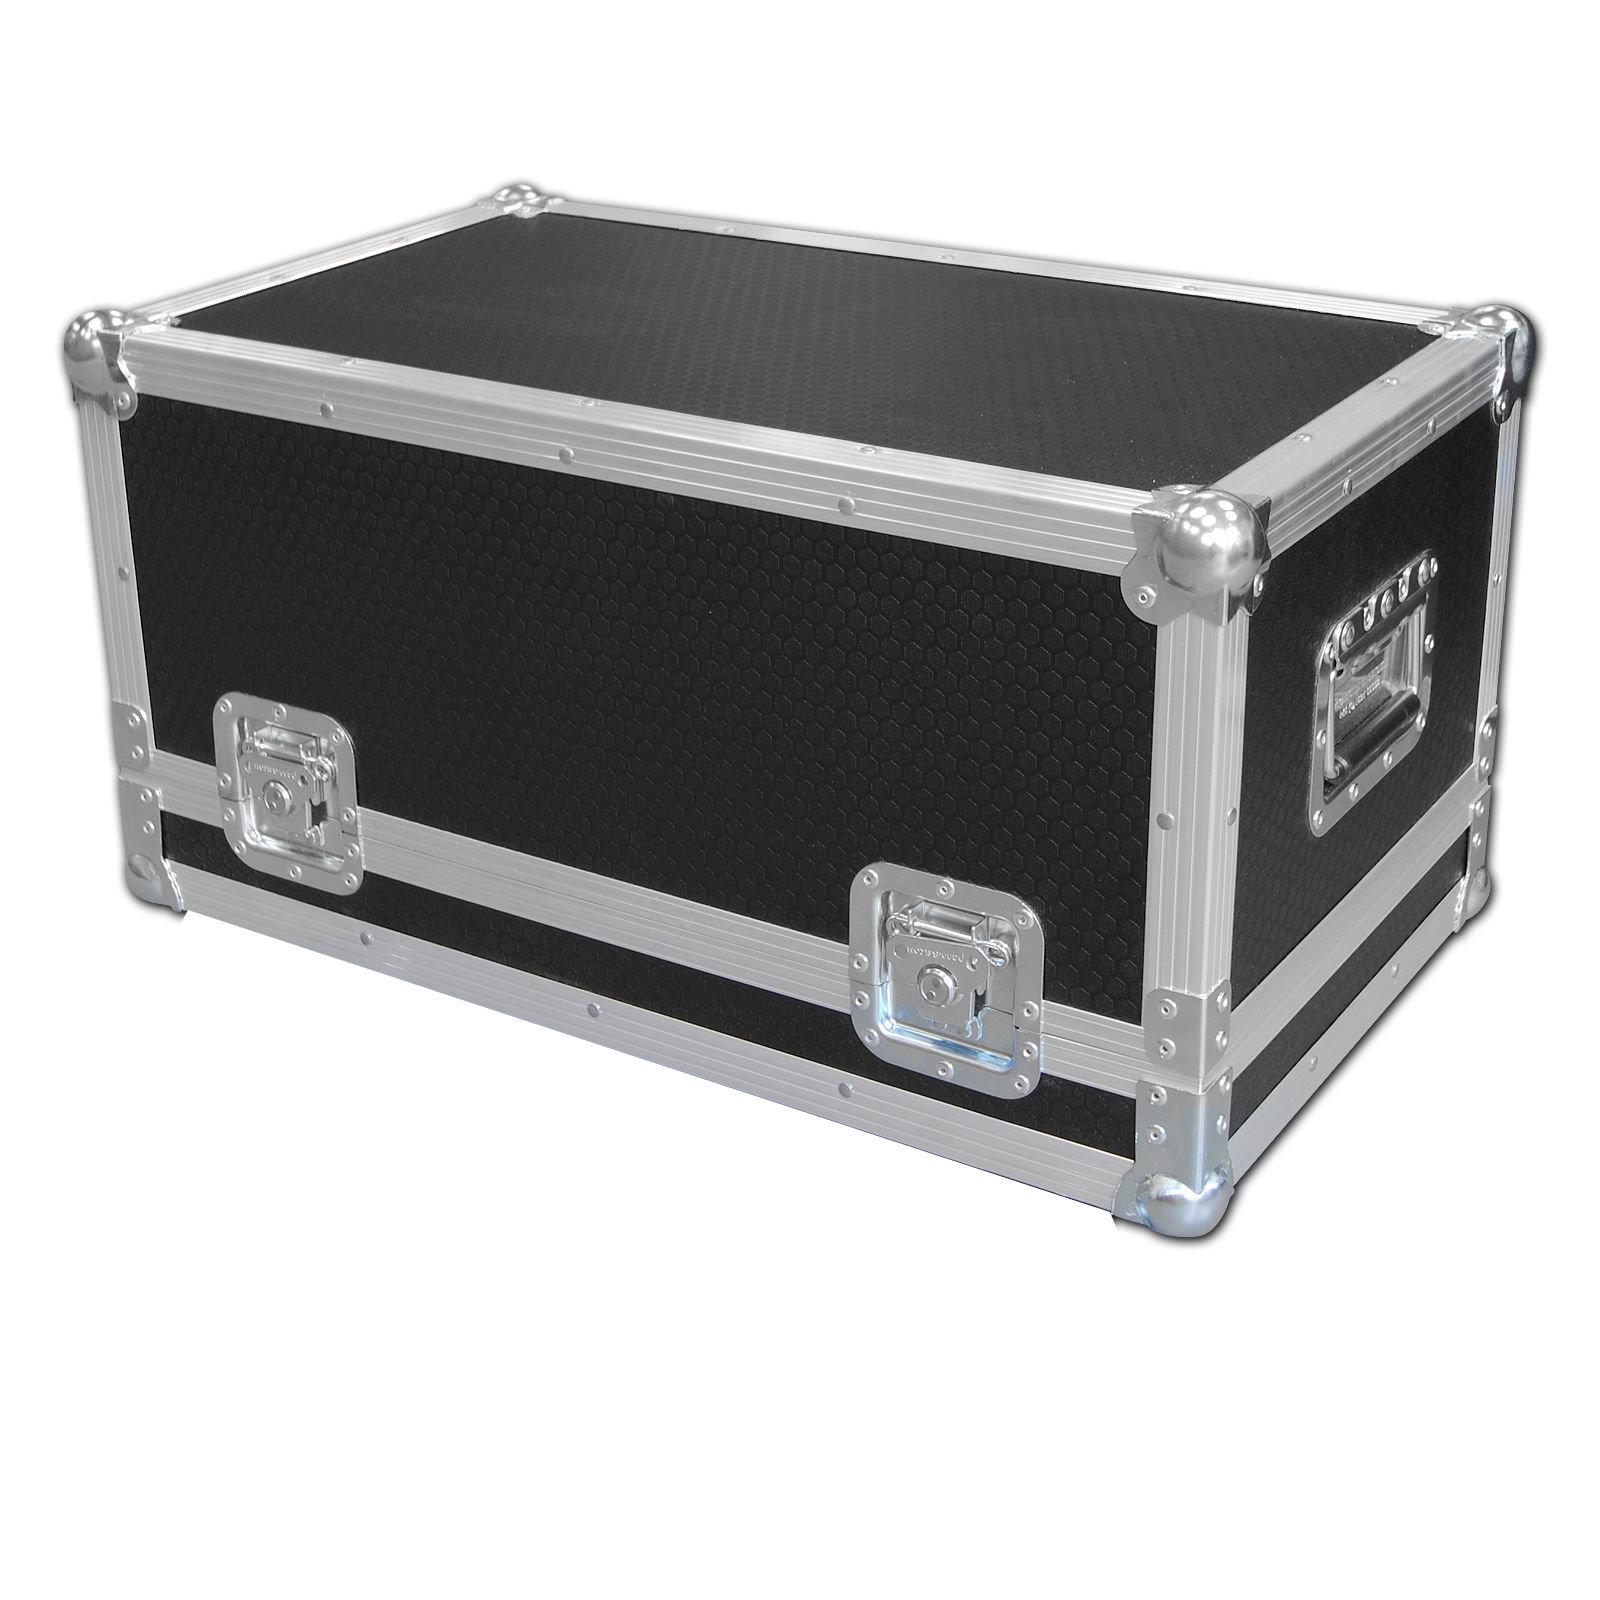 Guitar Amp Flightcases Uk : randall rm100 guitar amp head flight case ~ Vivirlamusica.com Haus und Dekorationen